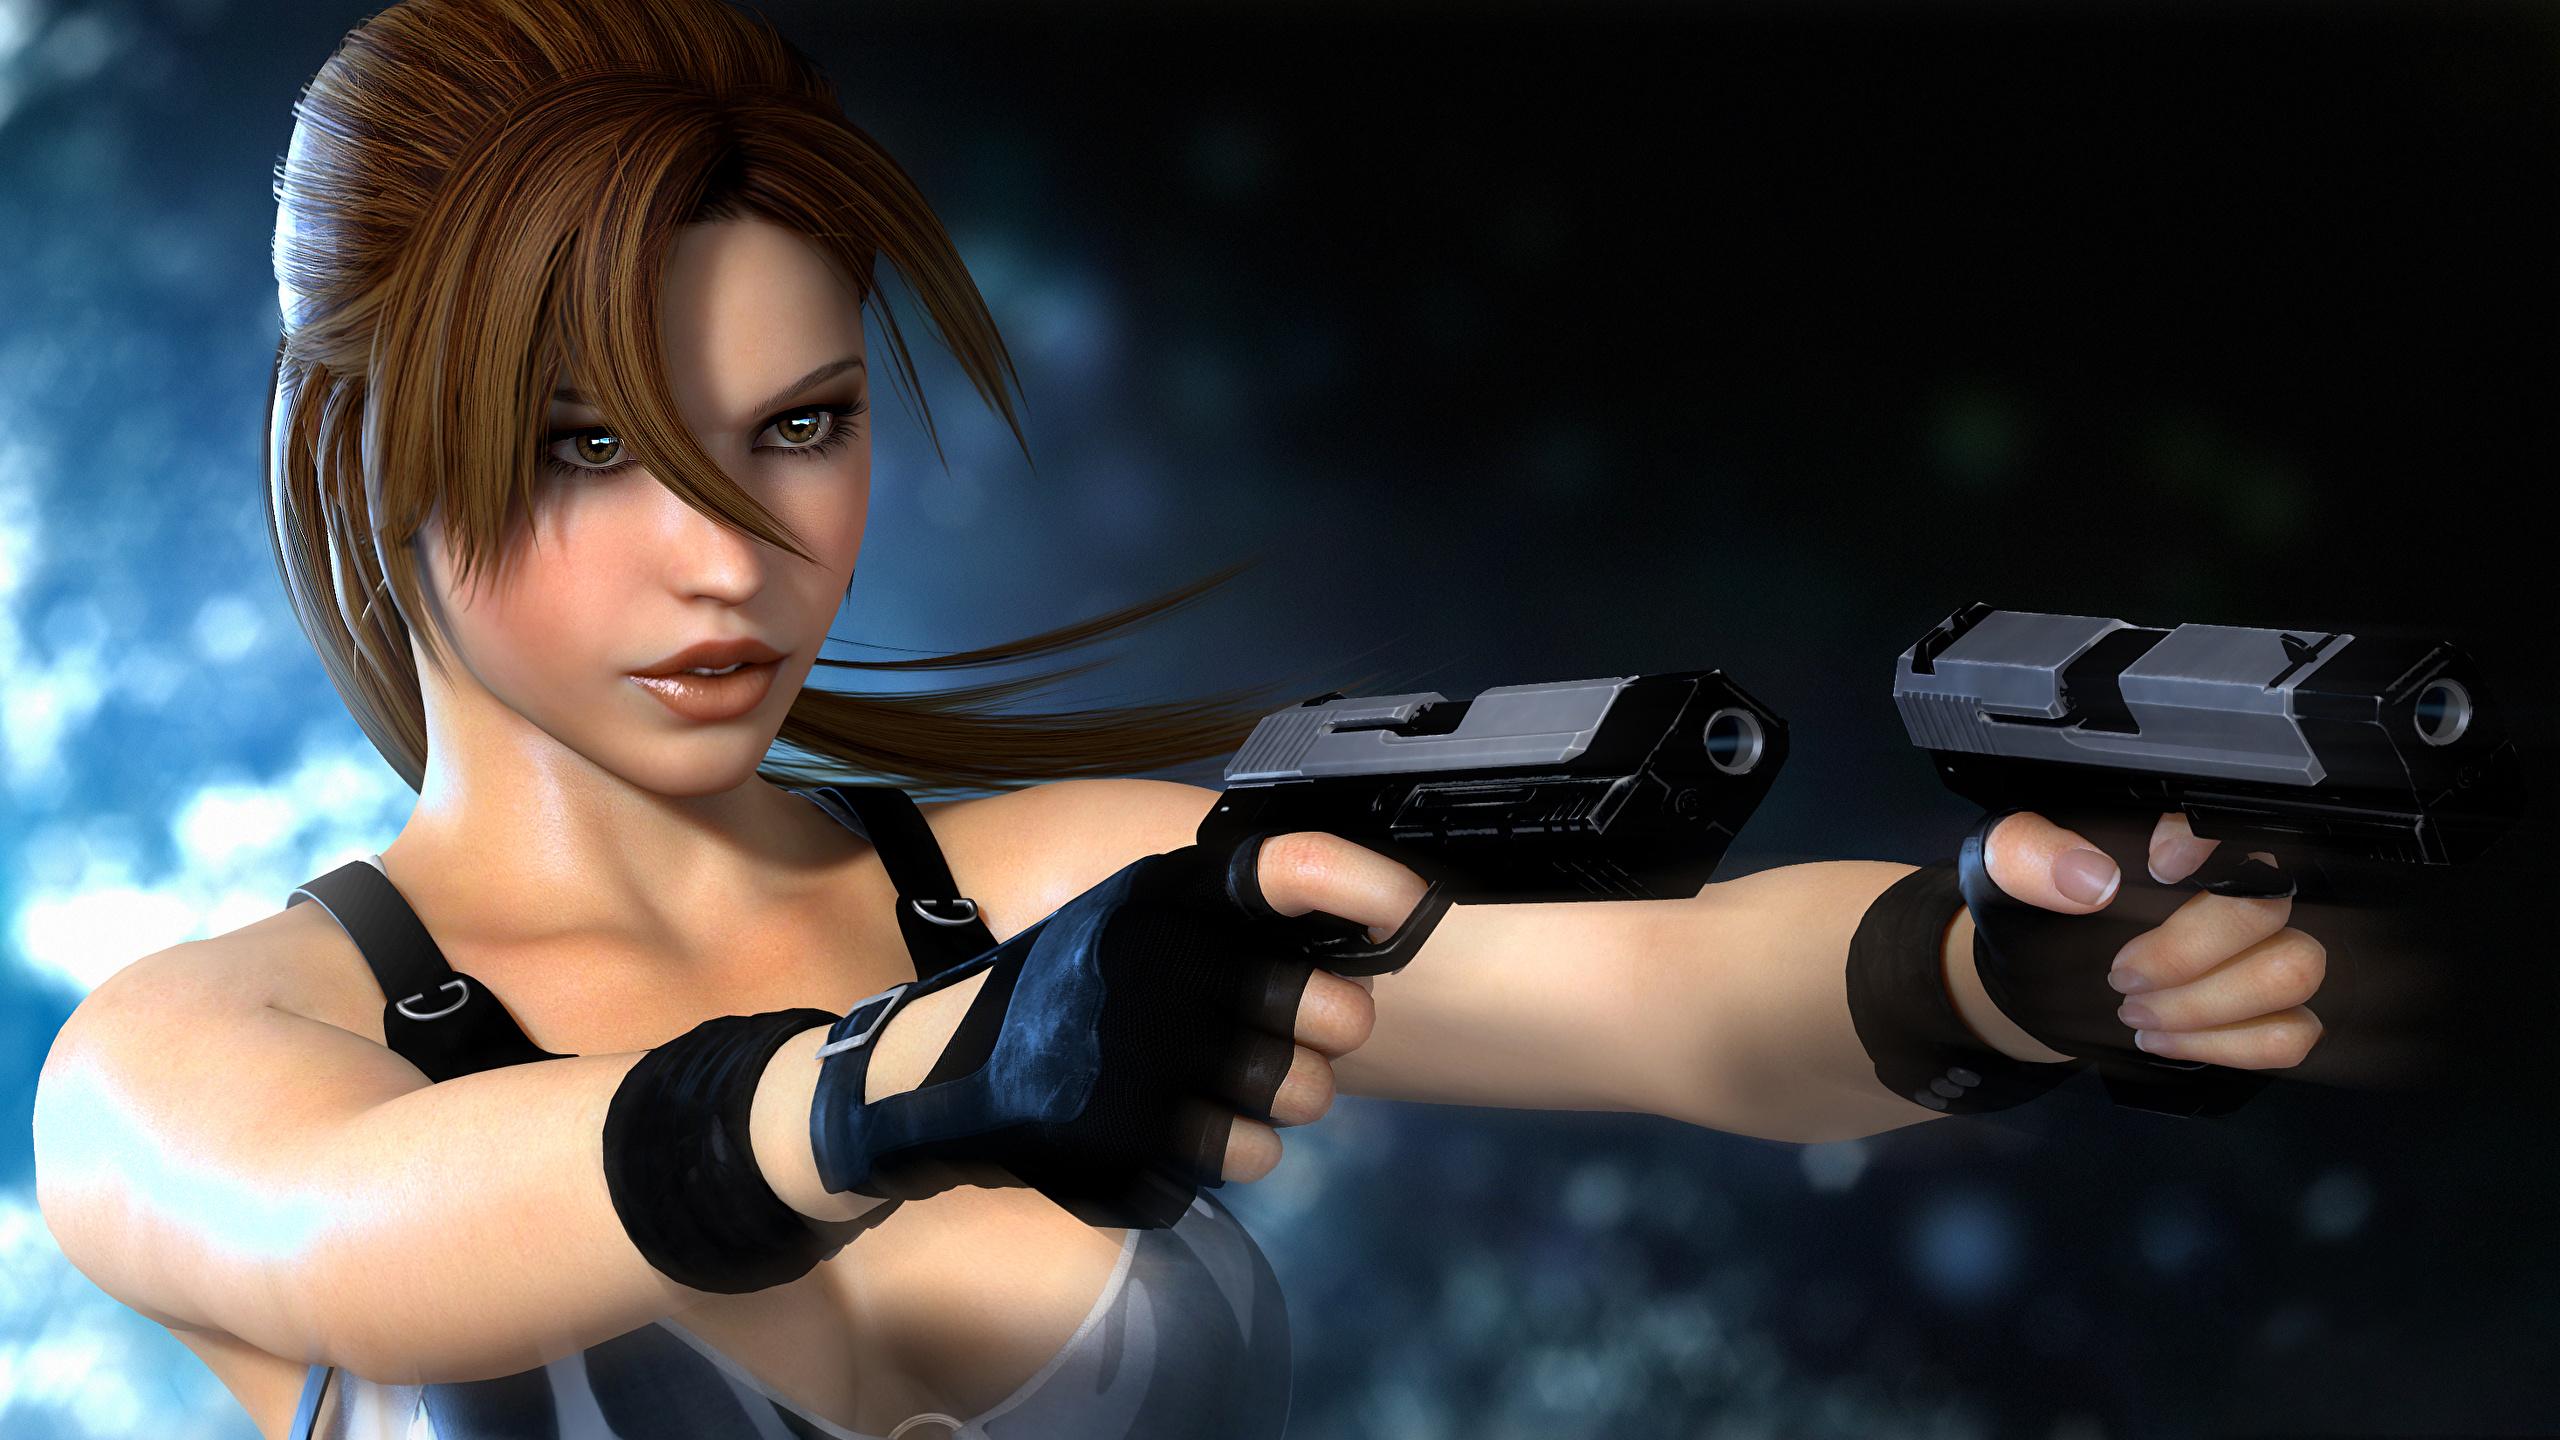 Lara croft hair nsfw films